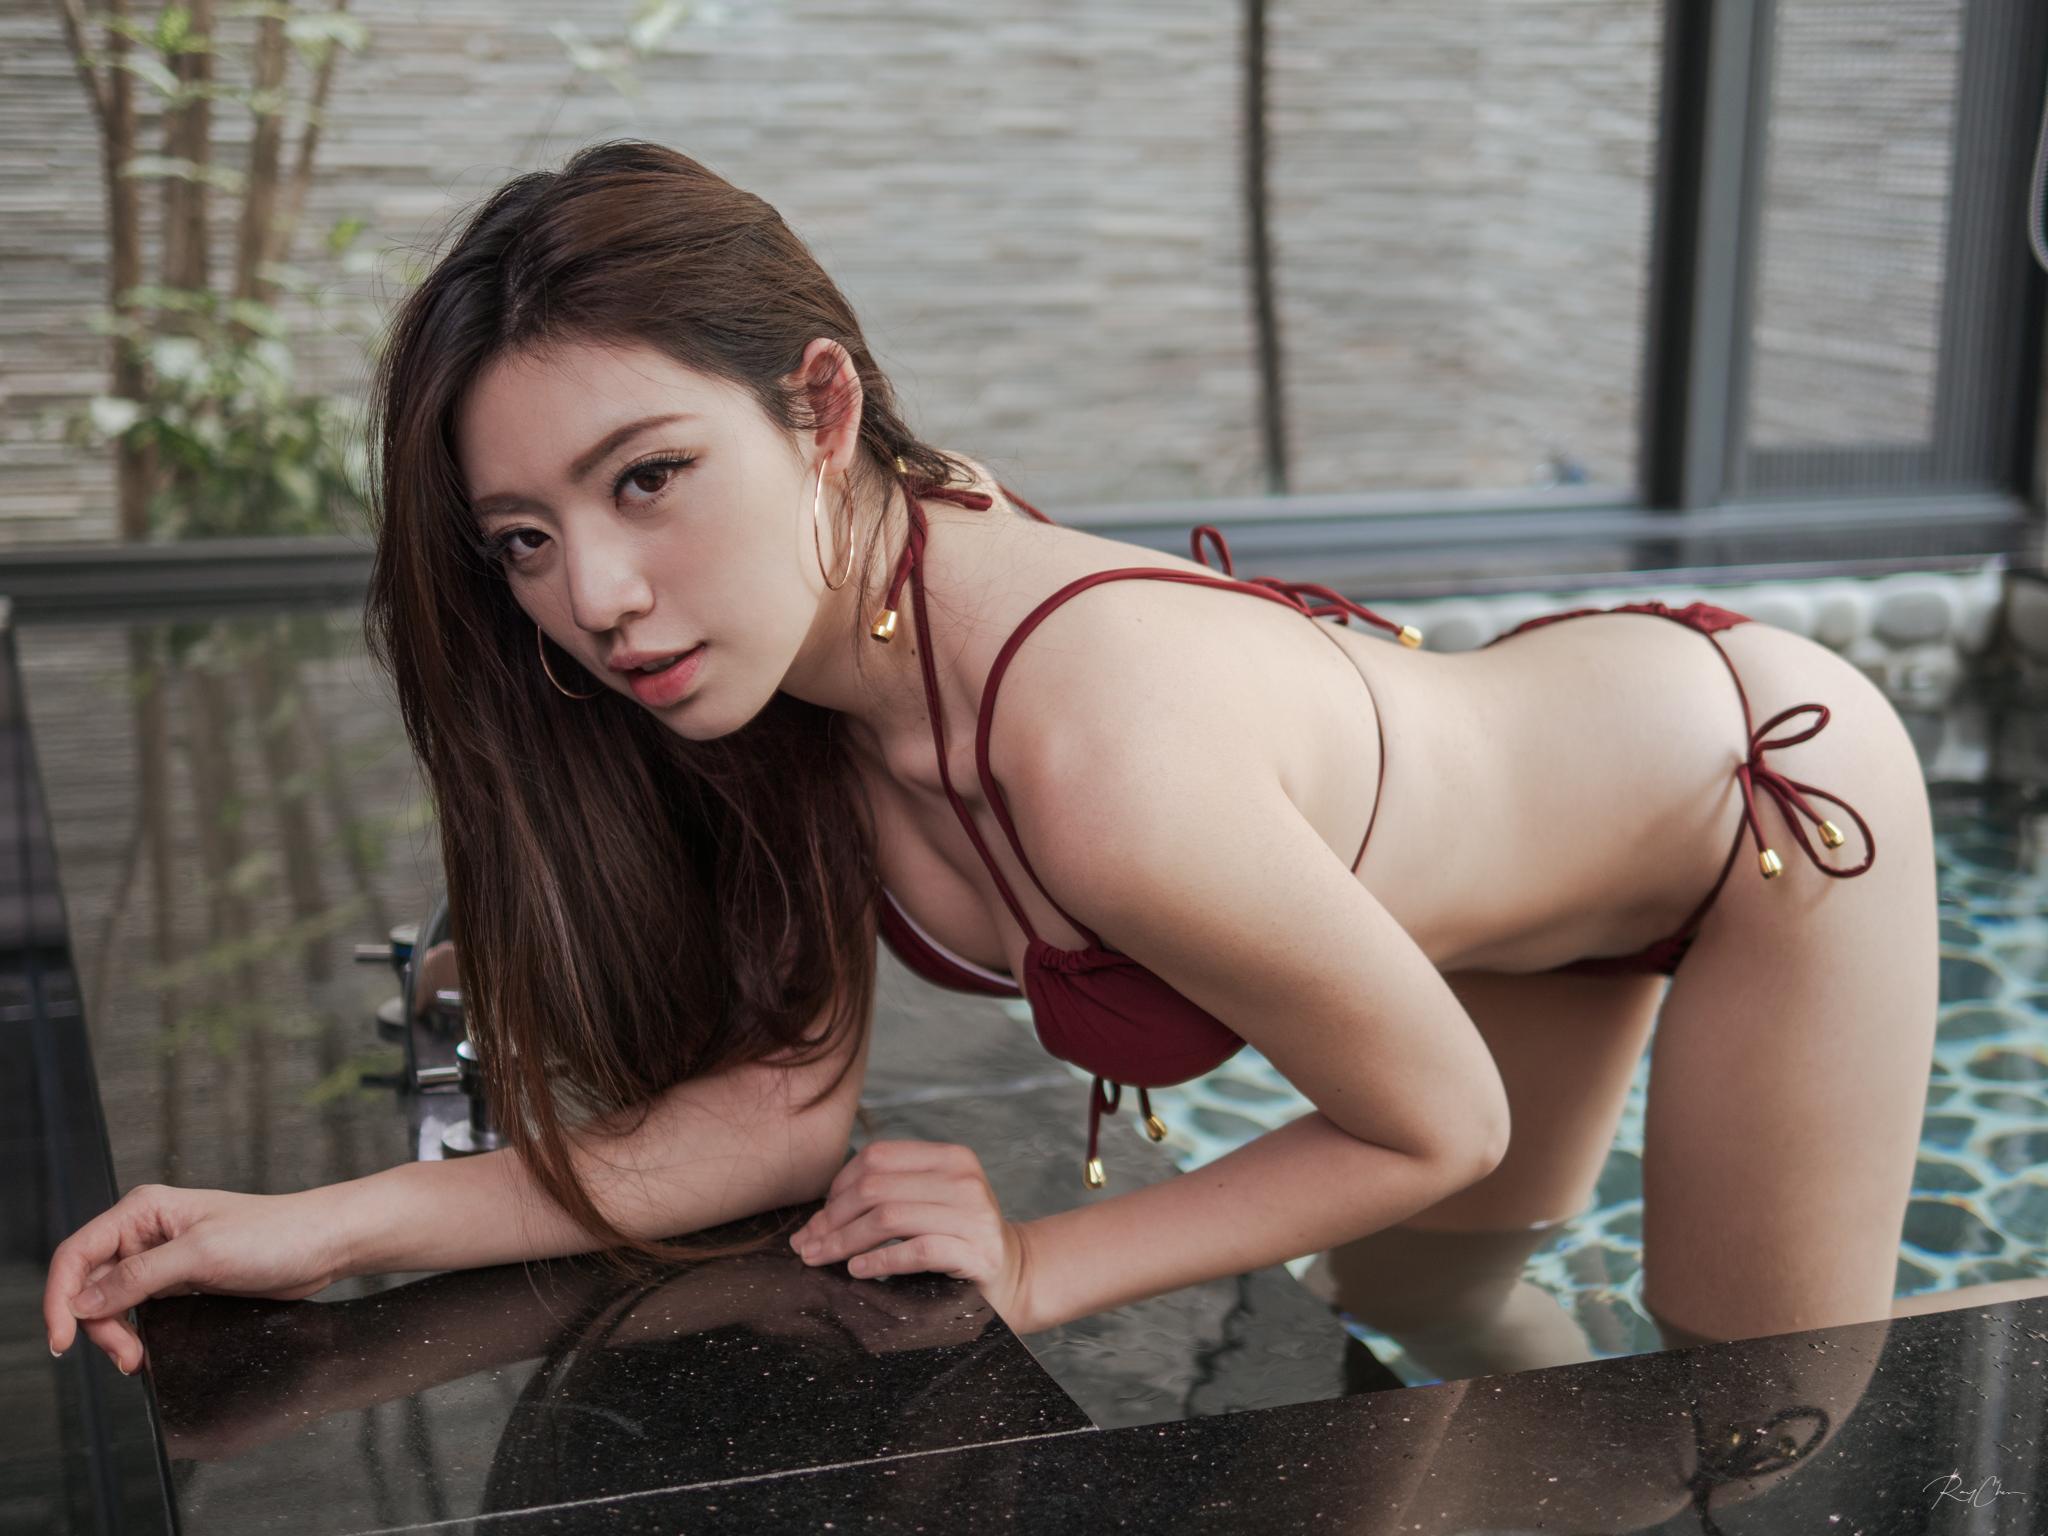 People 2048x1536 Asian women model brunette looking at viewer indoors hoop earrings bikini swimwear belly bent over hot tub depth of field women indoors Ray Chen Kiki Hsieh